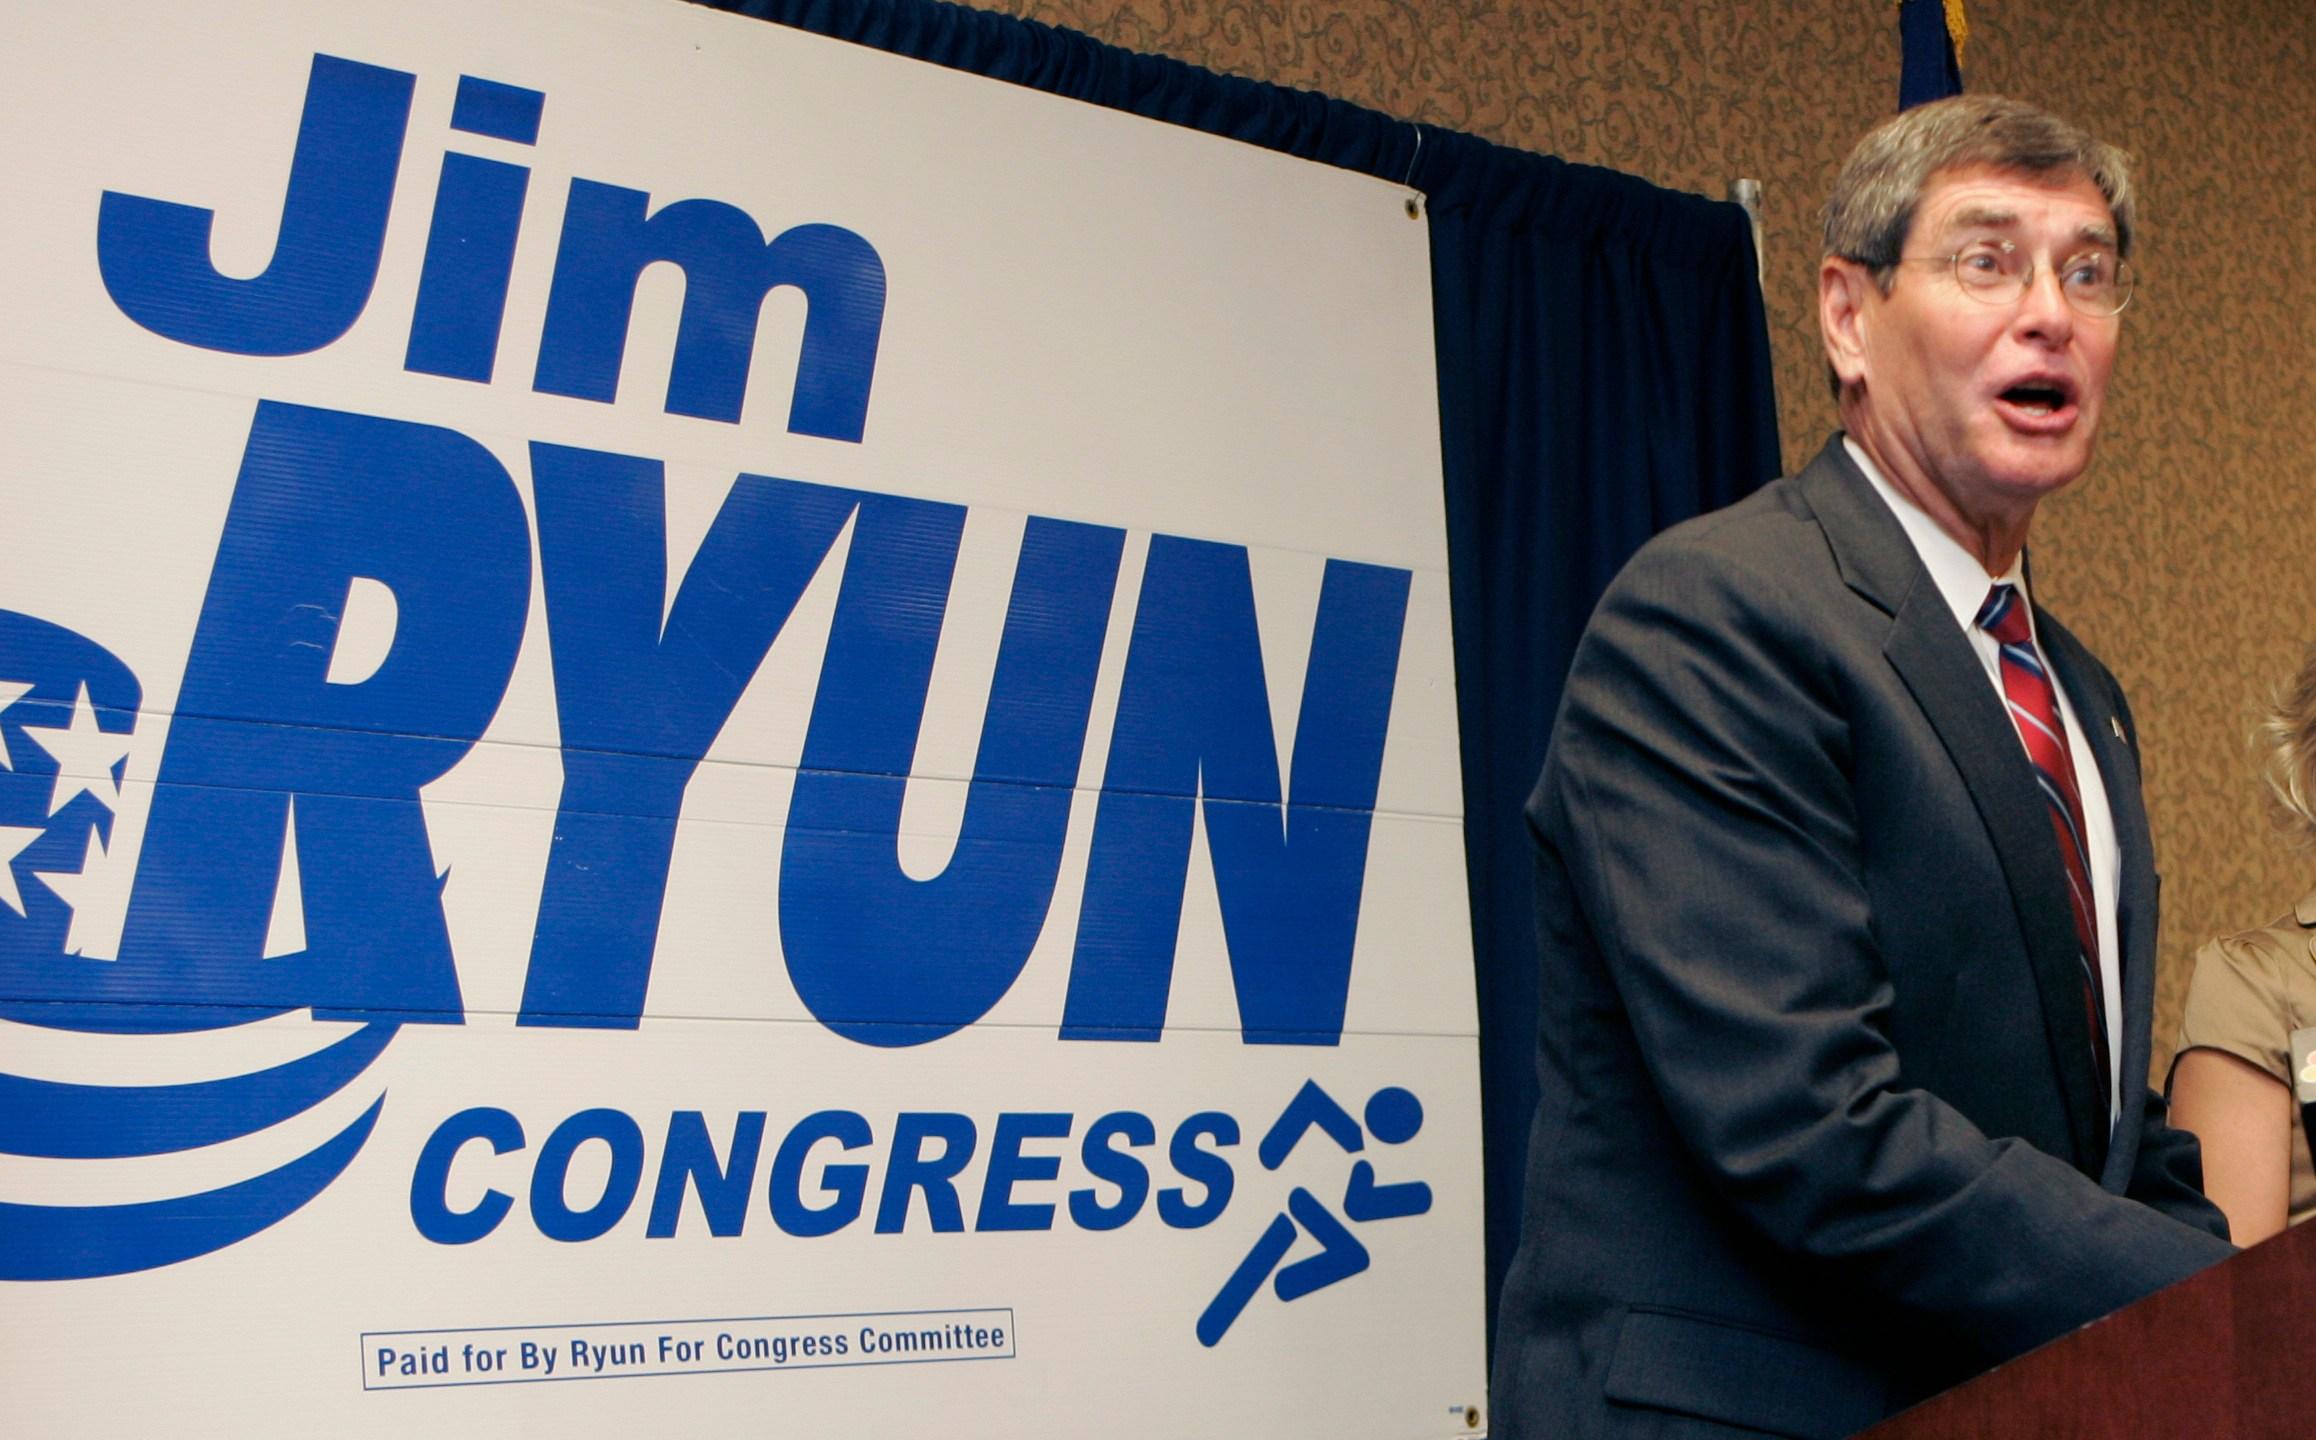 Jim Ryun